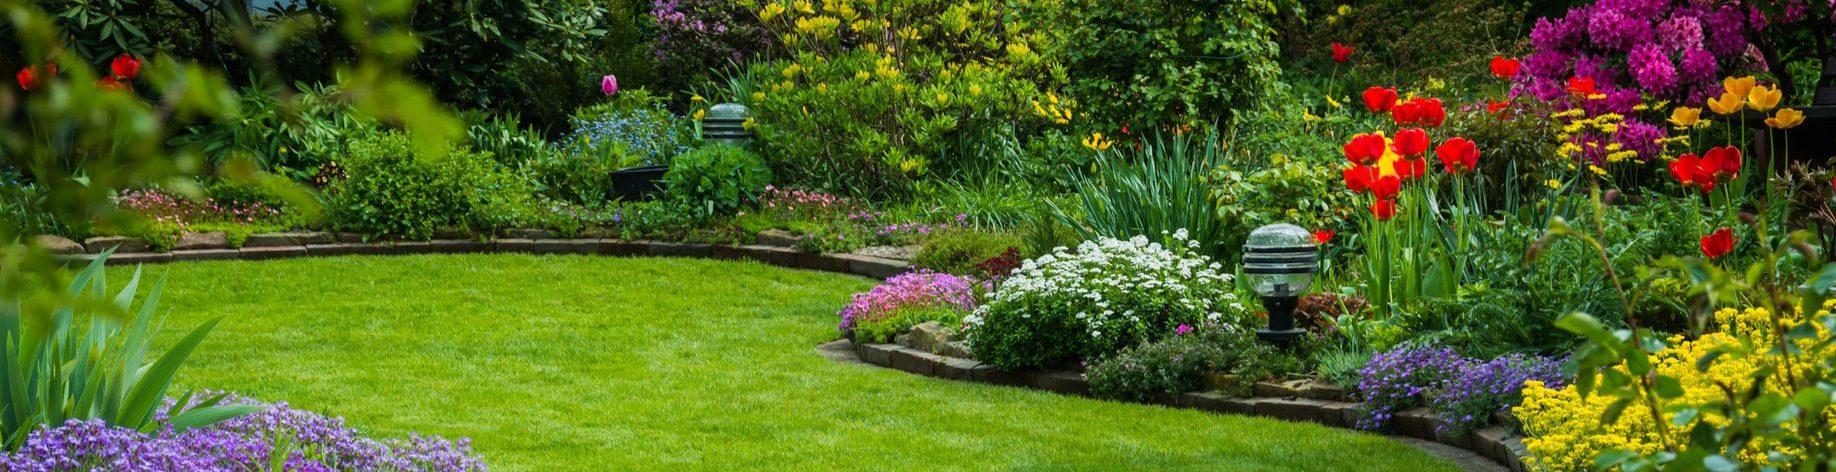 D co de jardin le blog de conseils de rohan for Blog deco jardin